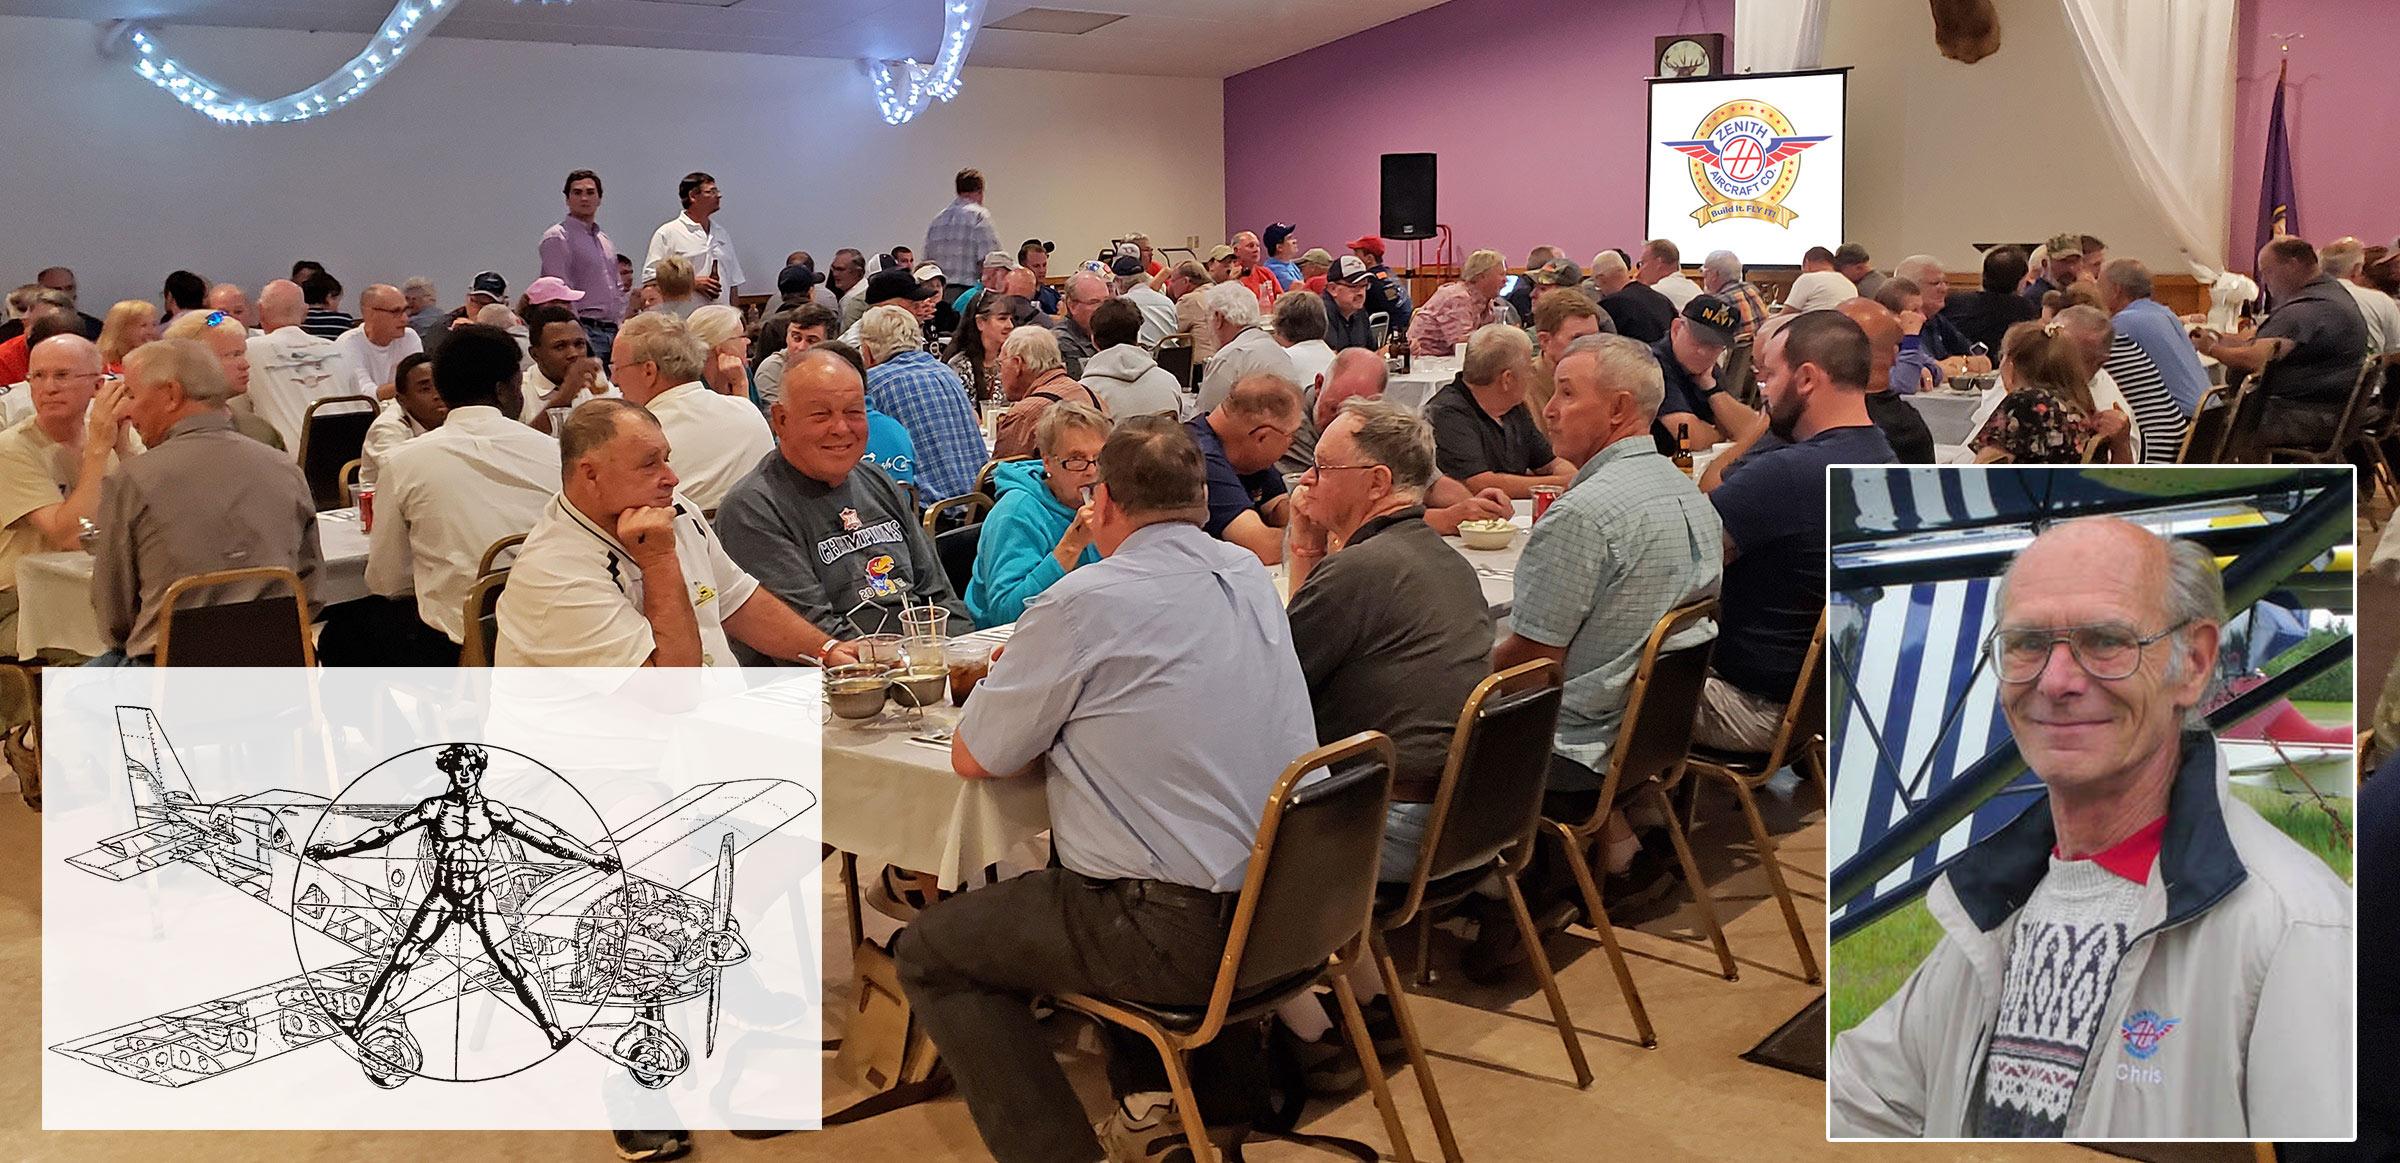 Zenair banquet at the Oshkosh Elks Lodge: https://bit.ly/zenith-banquet-osh21